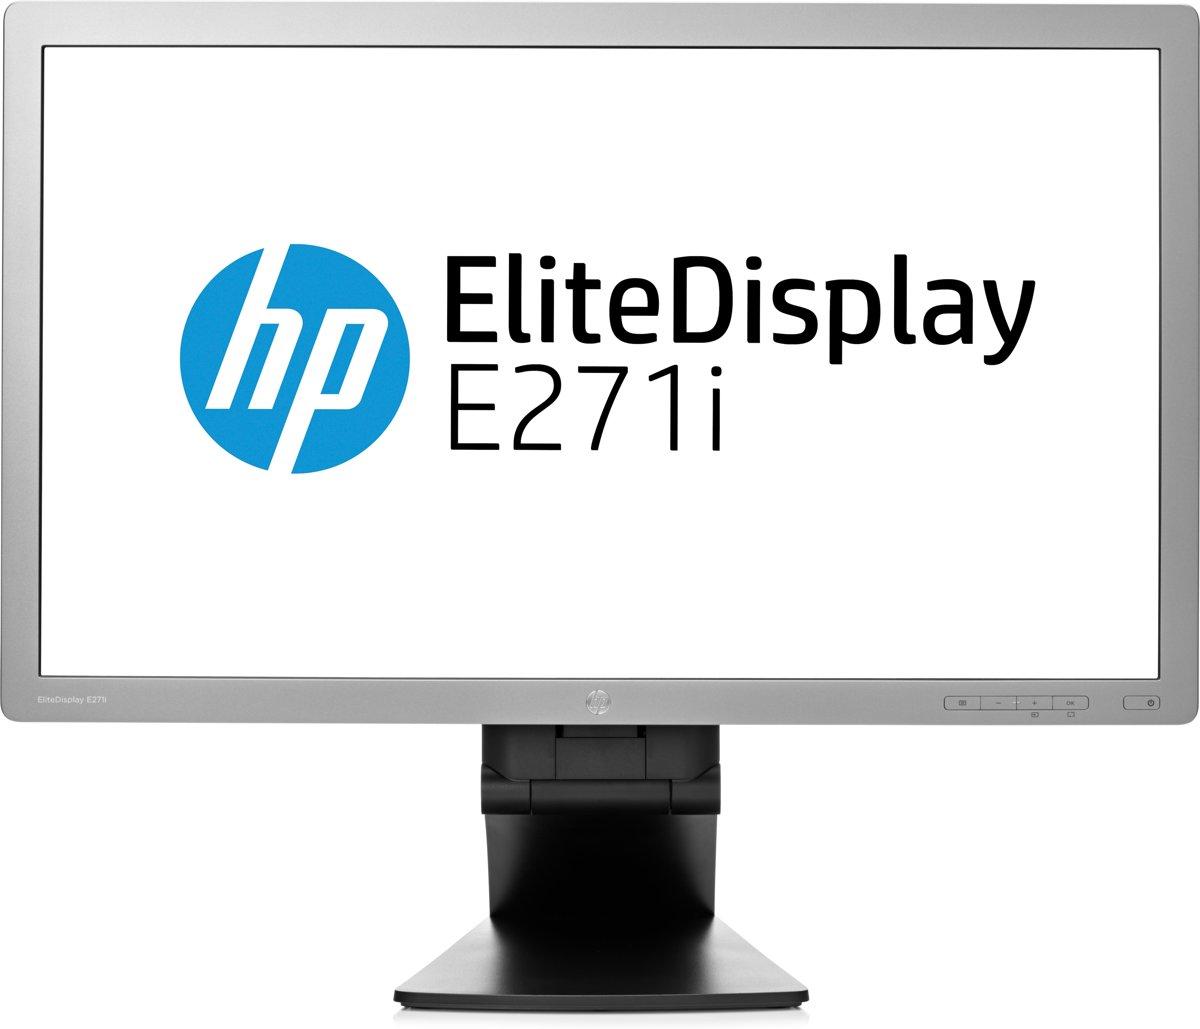 HP EliteDisplay E271i - IPS Monitor